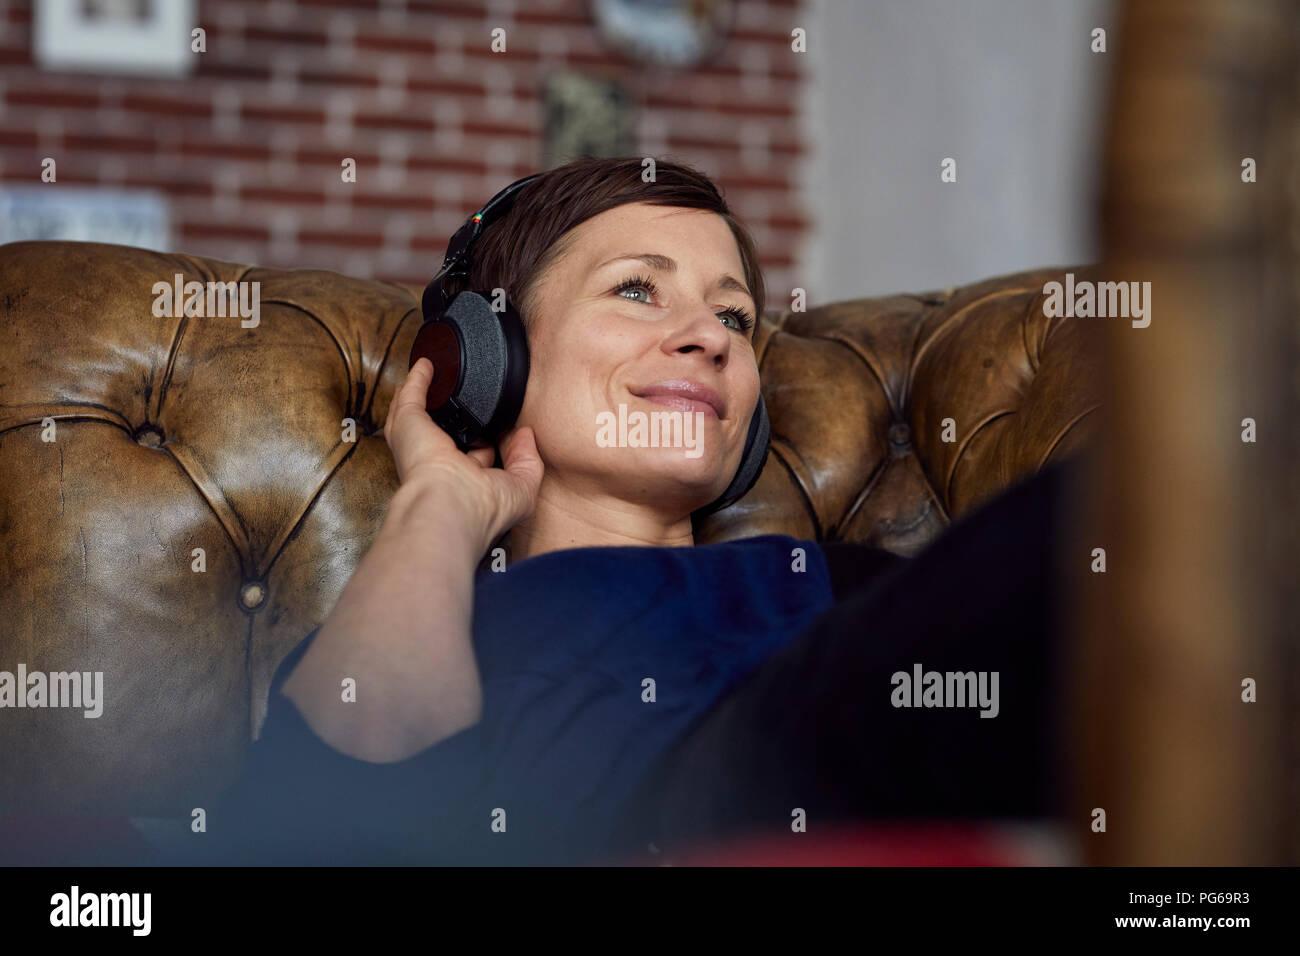 Woman with headphone lying on sofa, listening music - Stock Image